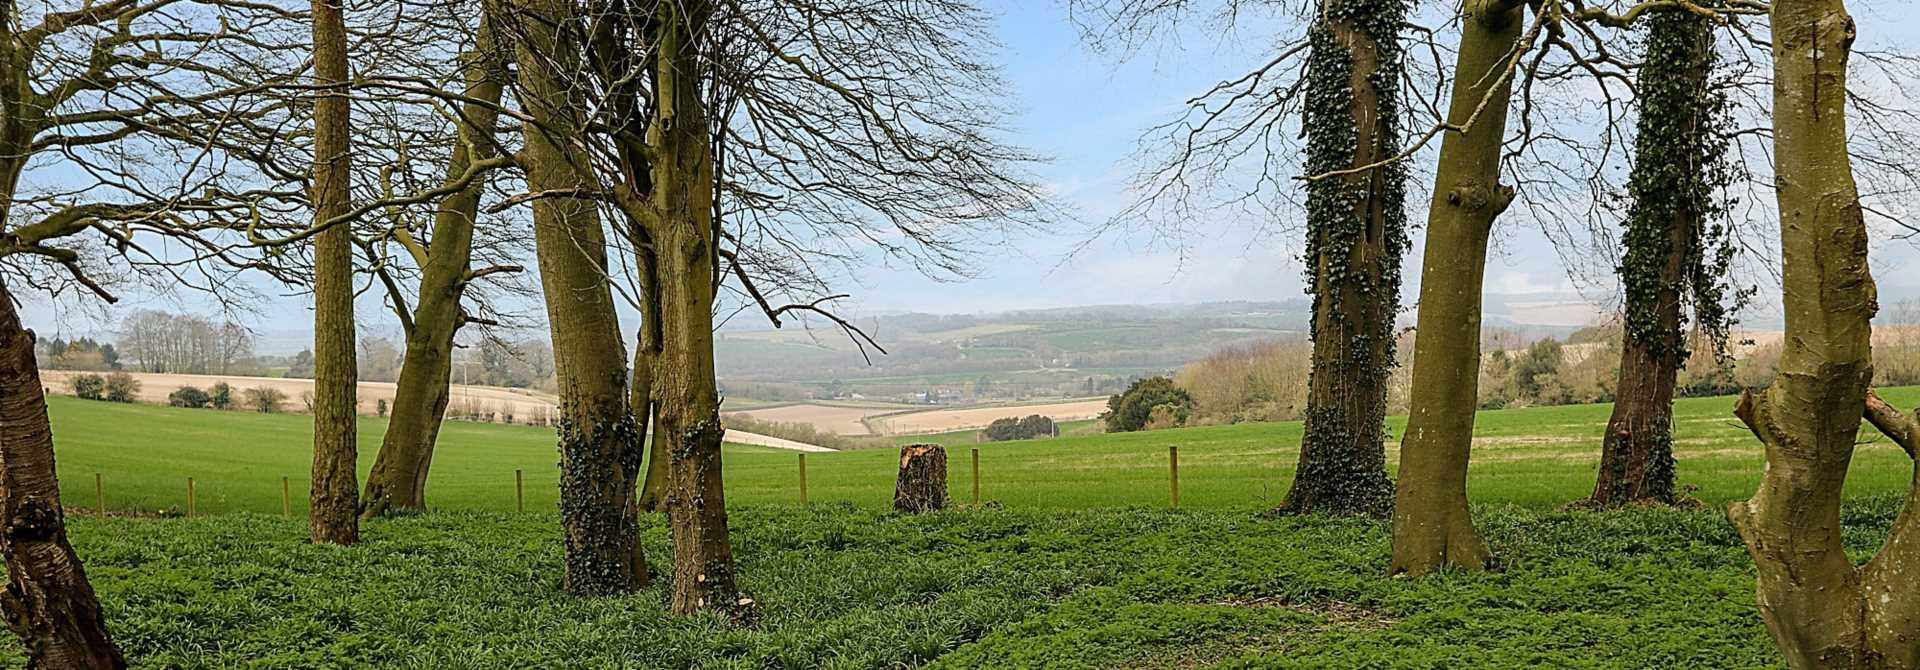 Aldworth, Berkshire, Image 18